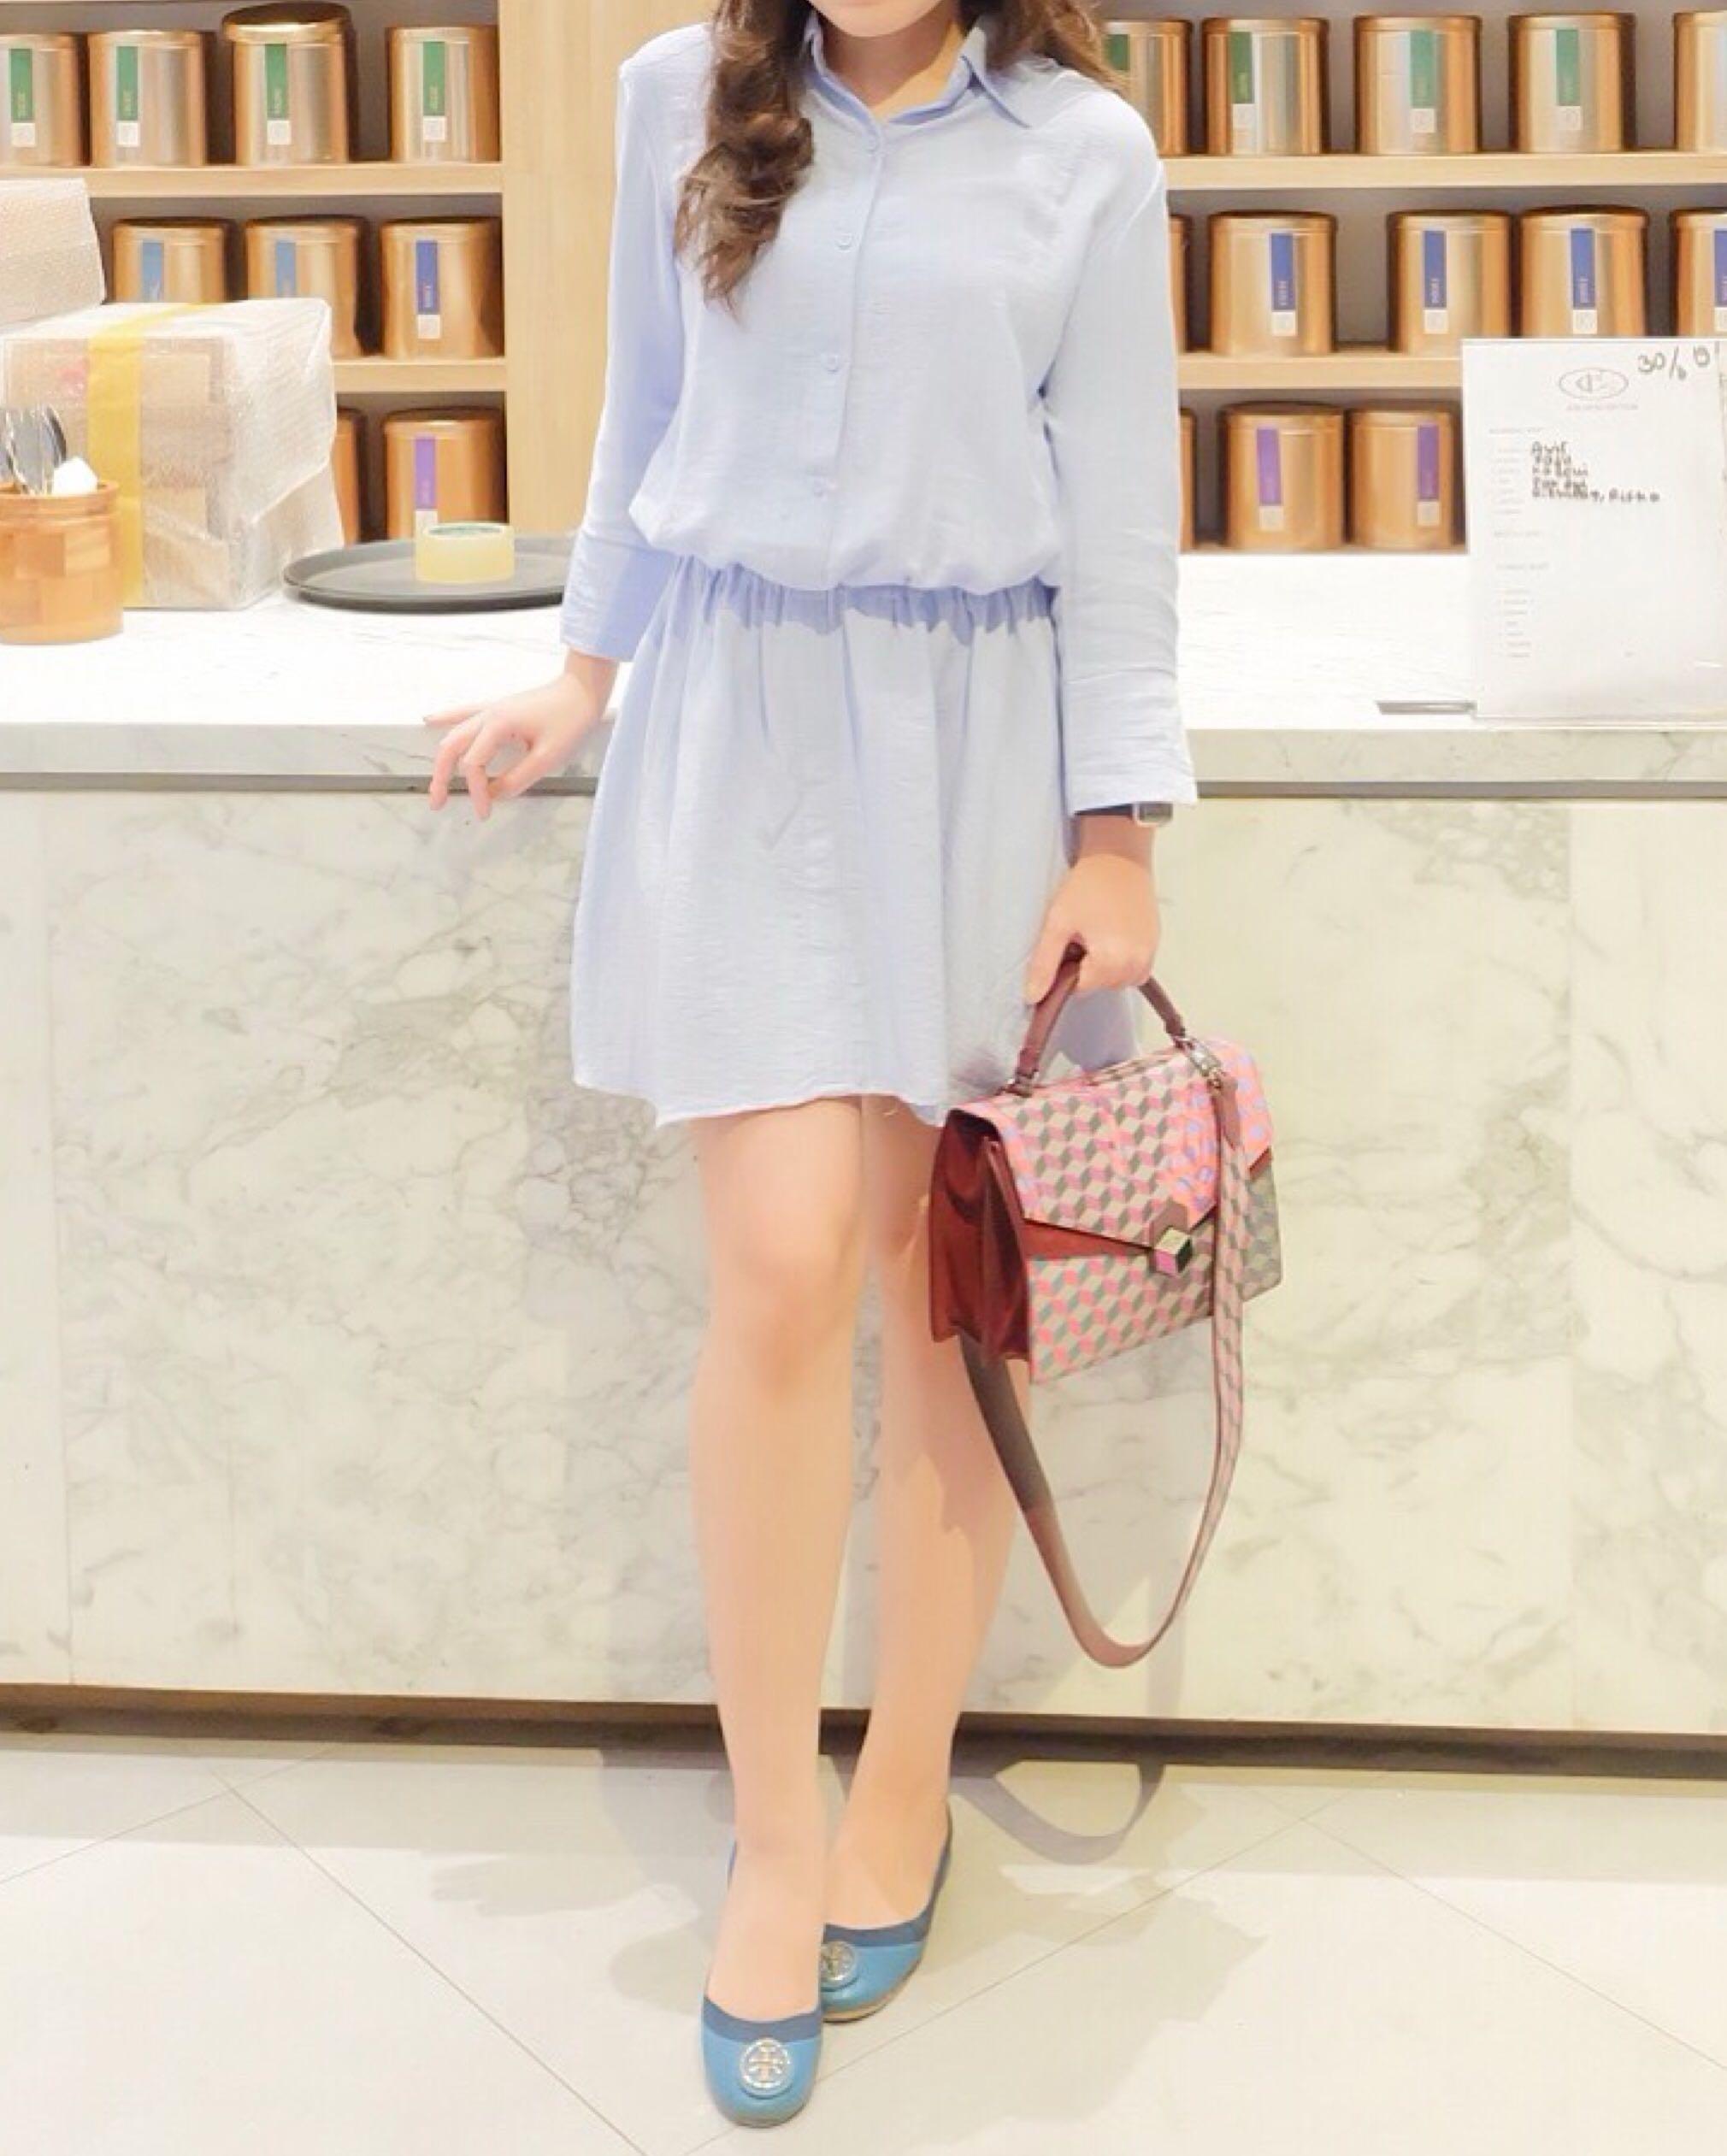 Baby Blue Dress H&M